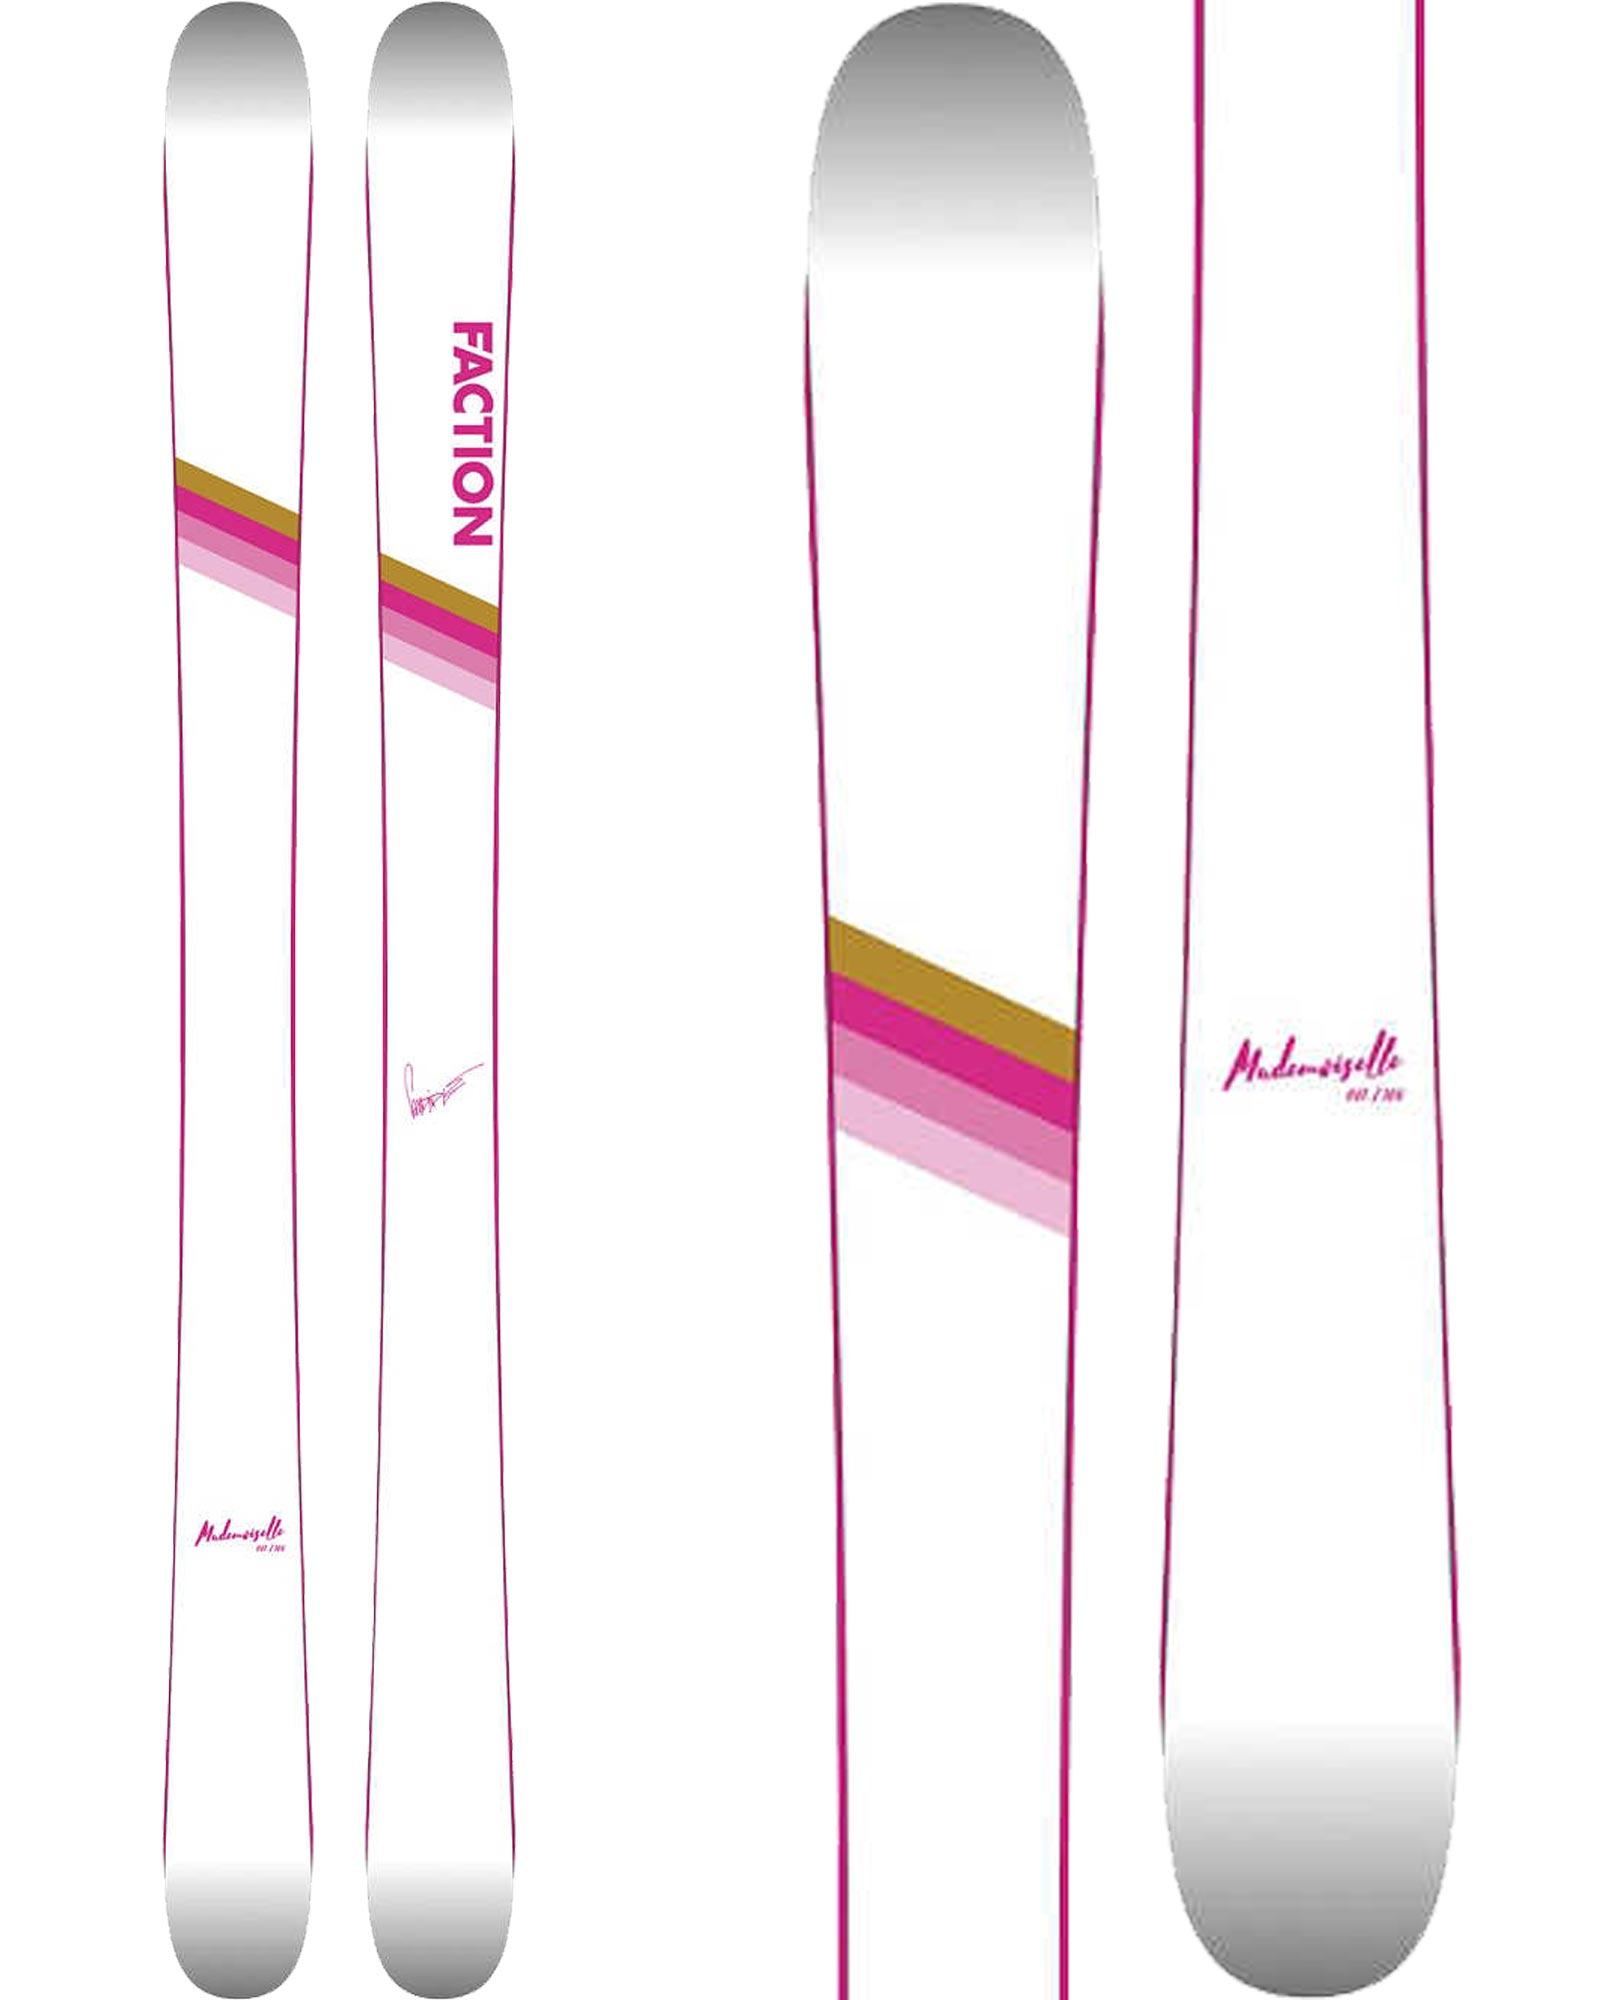 Faction Women's CT 2.0x Mademoiselle Ltd Edition Freestyle Skis 2019 / 2020 0